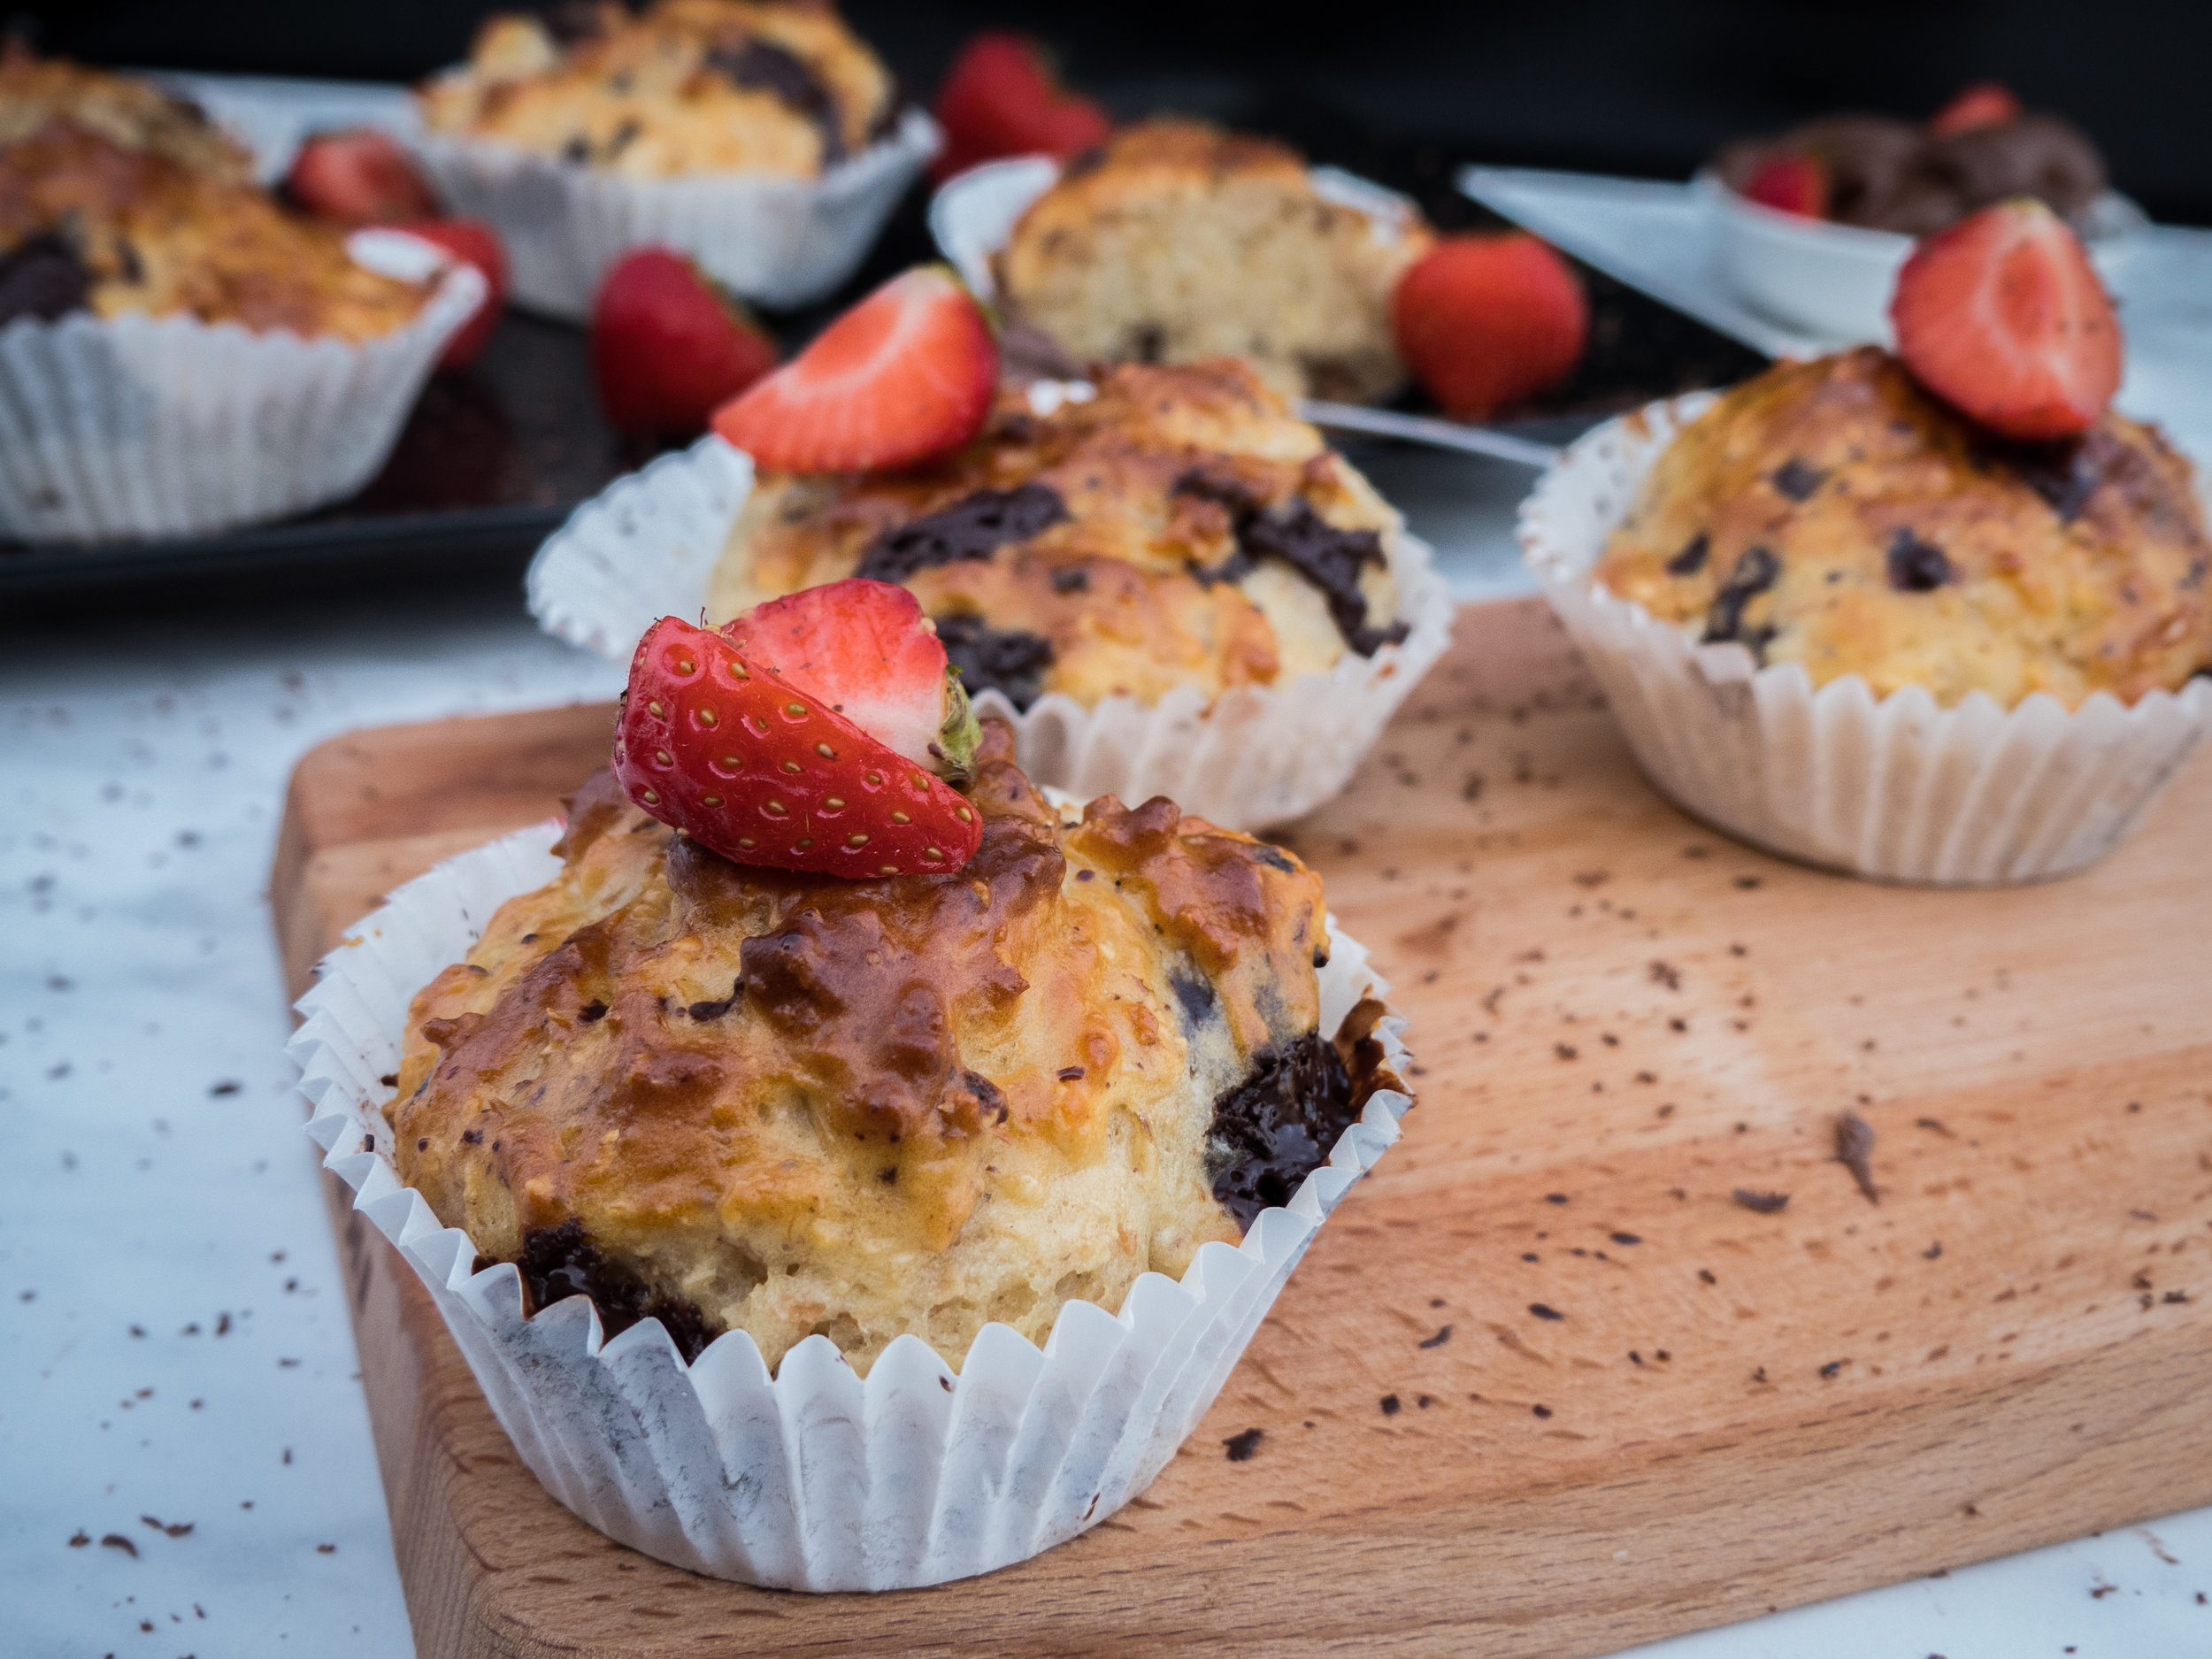 Vanilla, chocolate, coco and strawberry cupcakes7.jpg